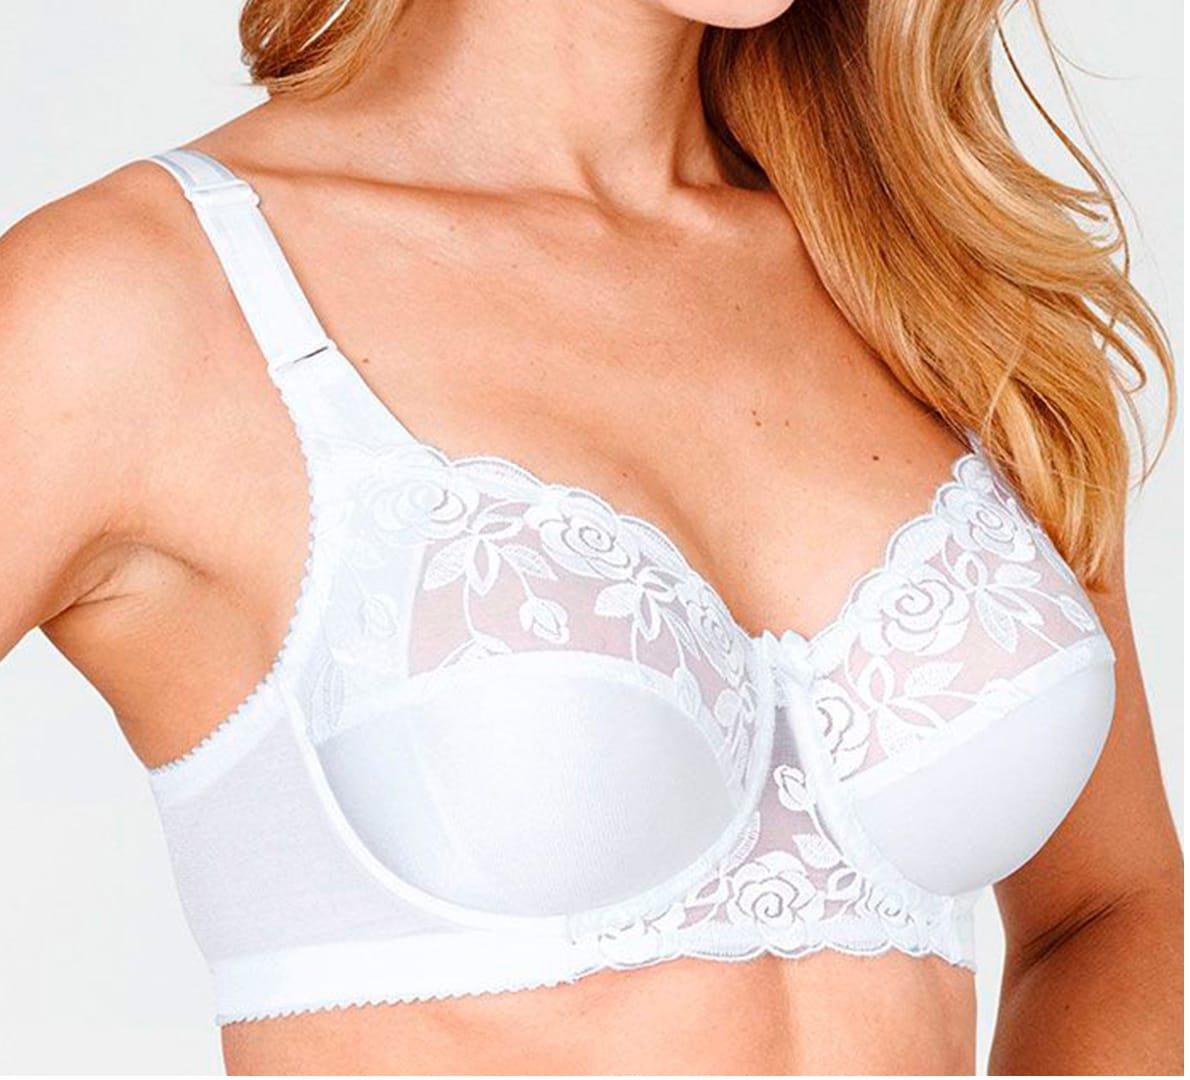 Embroidered bra